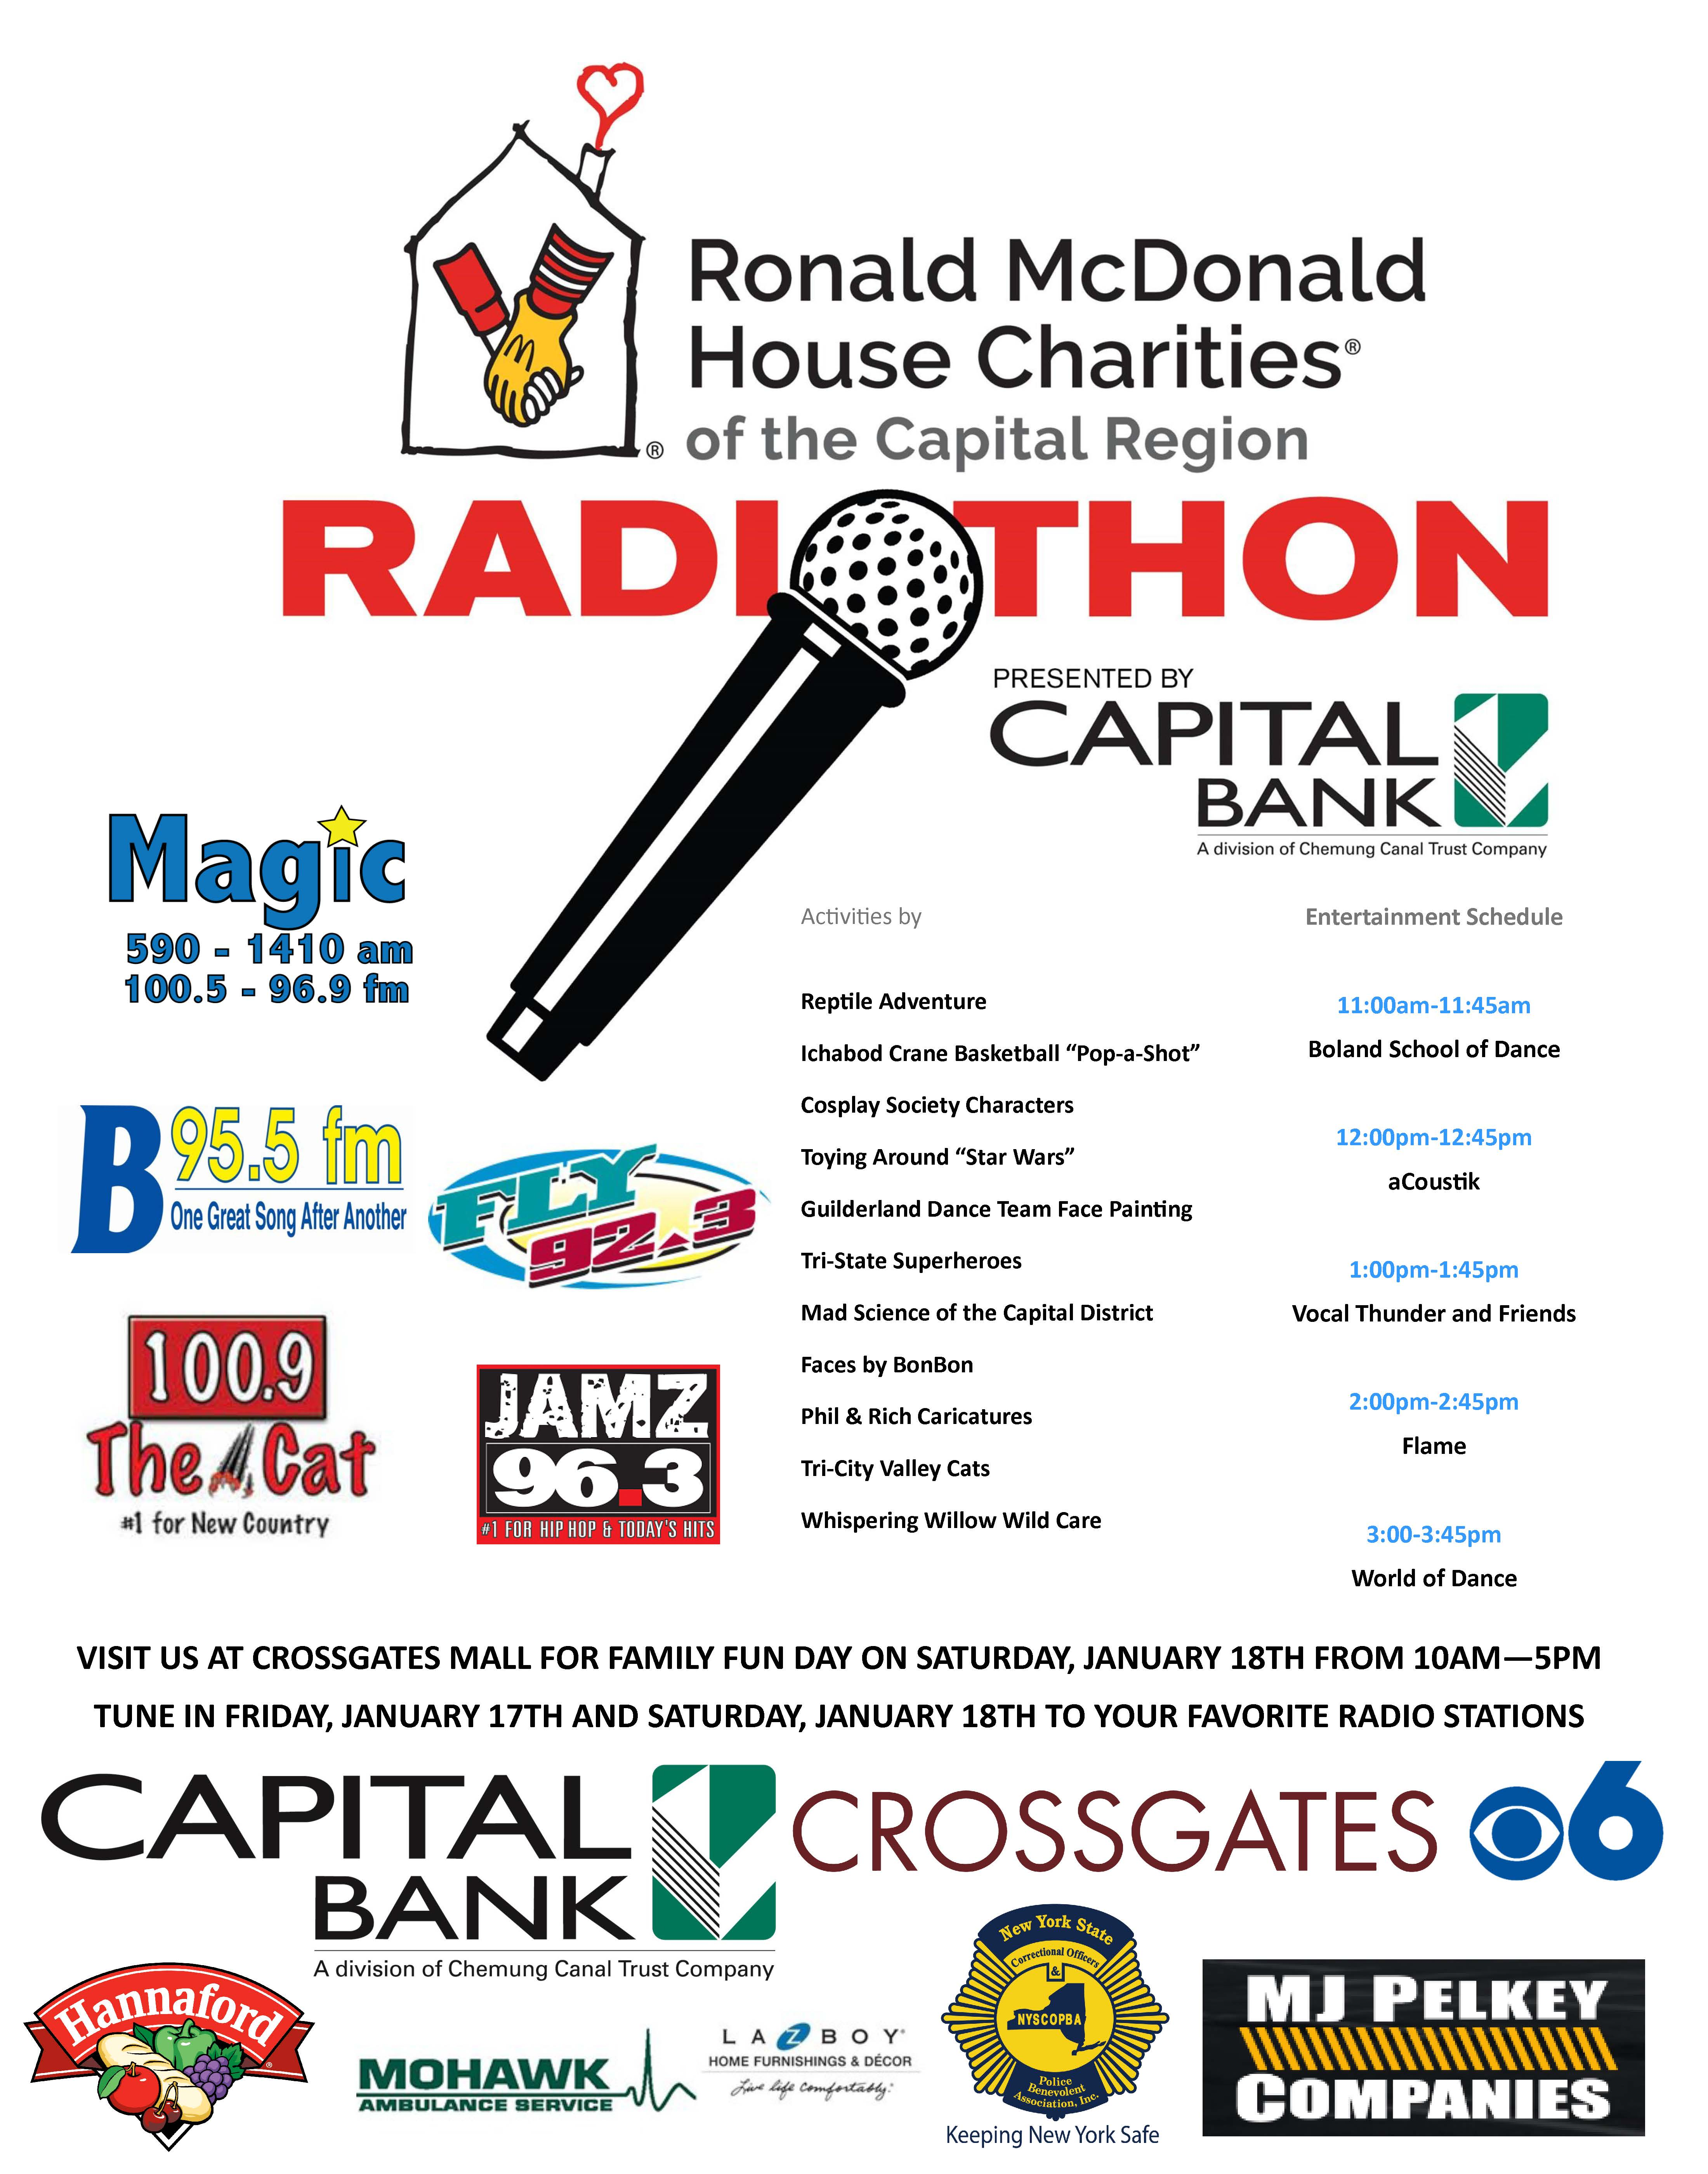 2020 Radiothon with entertainment